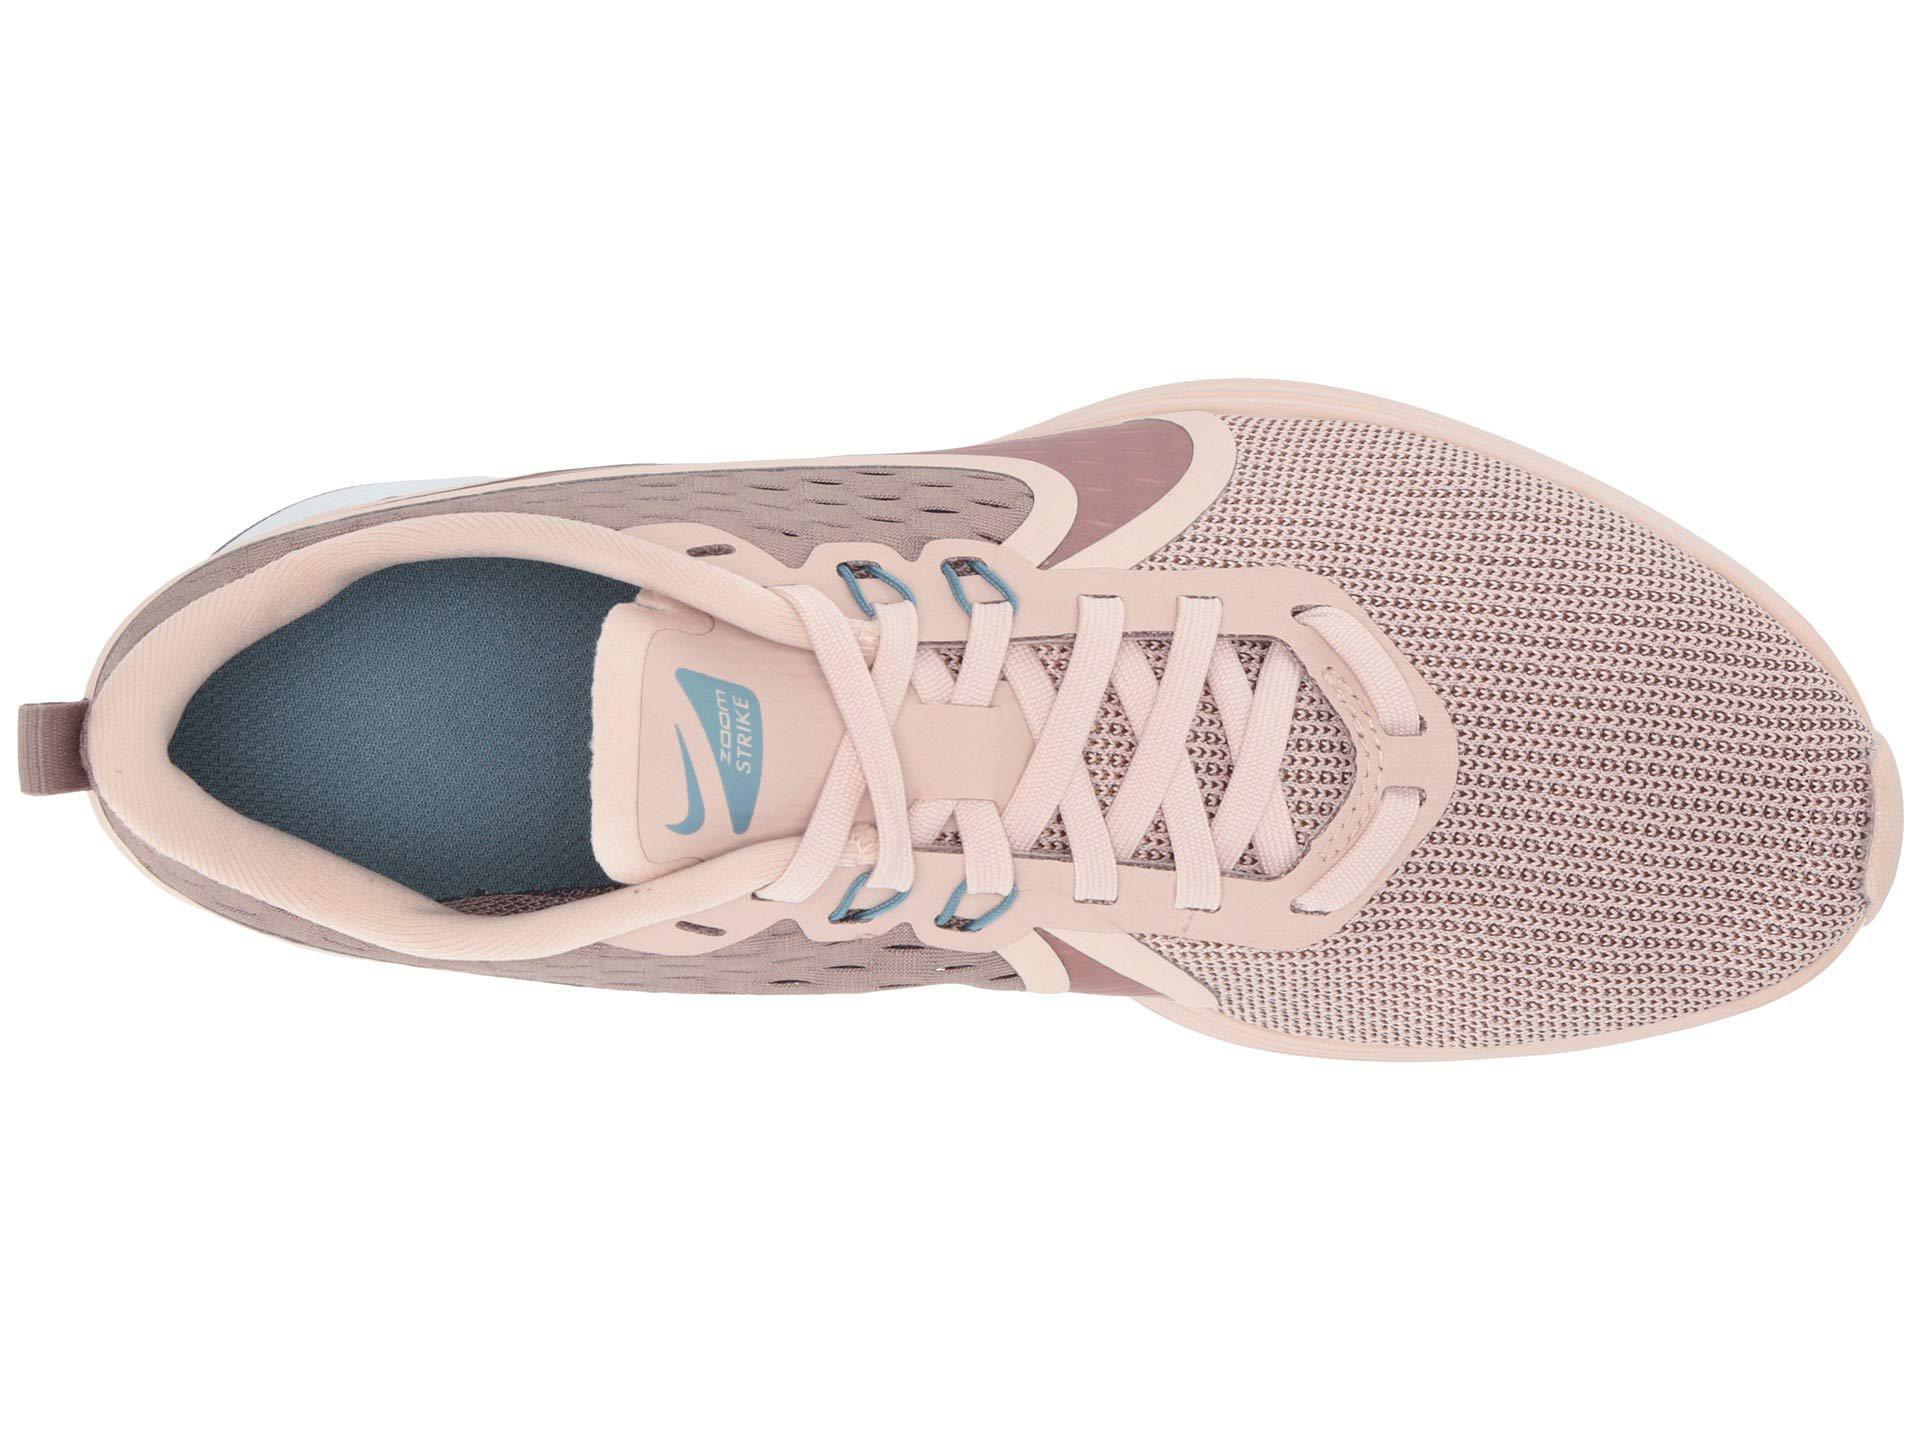 81c207f324ccb Lyst - Nike Zoom Strike 2 (black anthracite white) Women u0027s Running  Shoes